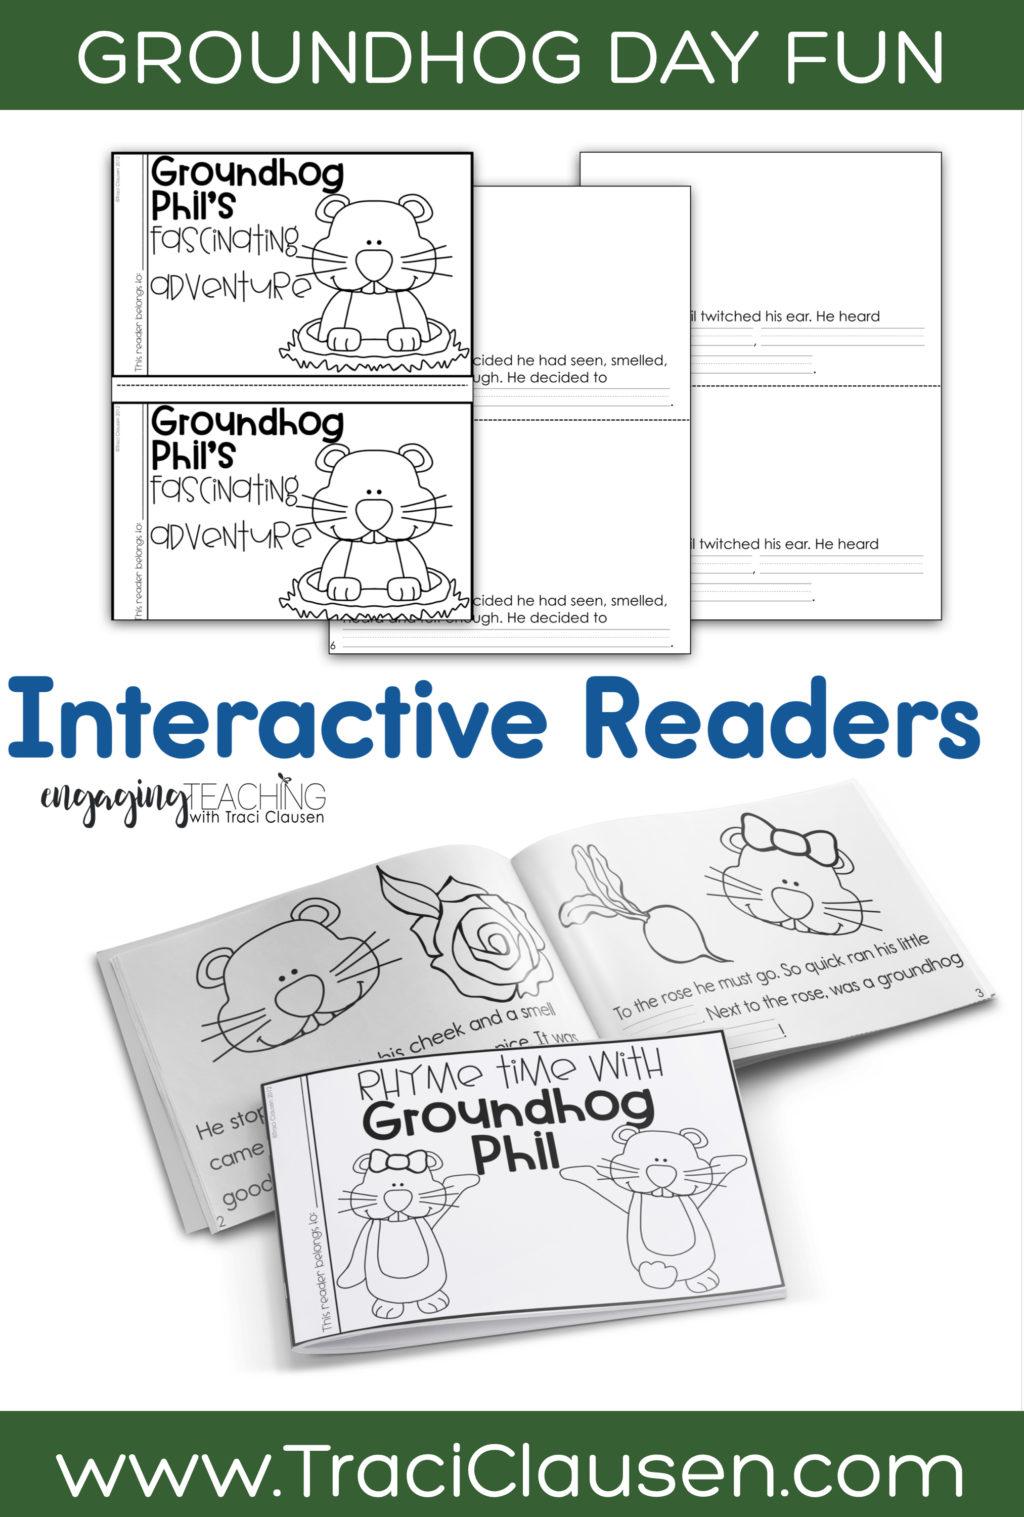 Groundhog Phil Interactive Readers